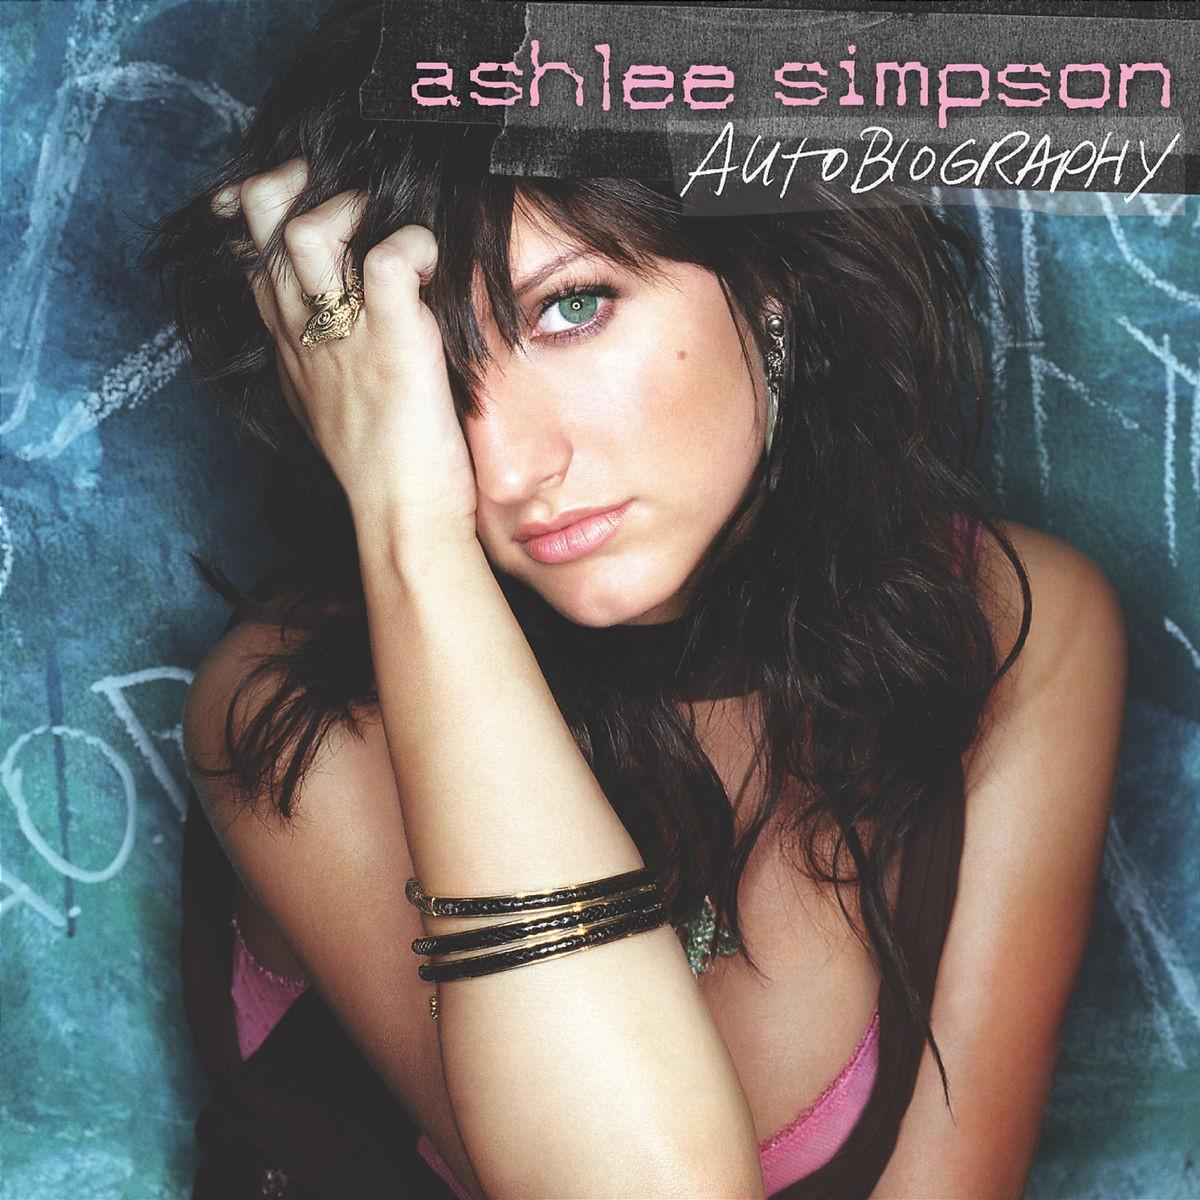 http://2.bp.blogspot.com/_3oLB6Otdlcs/TUGXSpUVT7I/AAAAAAAAJig/hhtfYDDBjnM/s1600/ashlee_simpson_autobiography_2004_cd-front.jpg